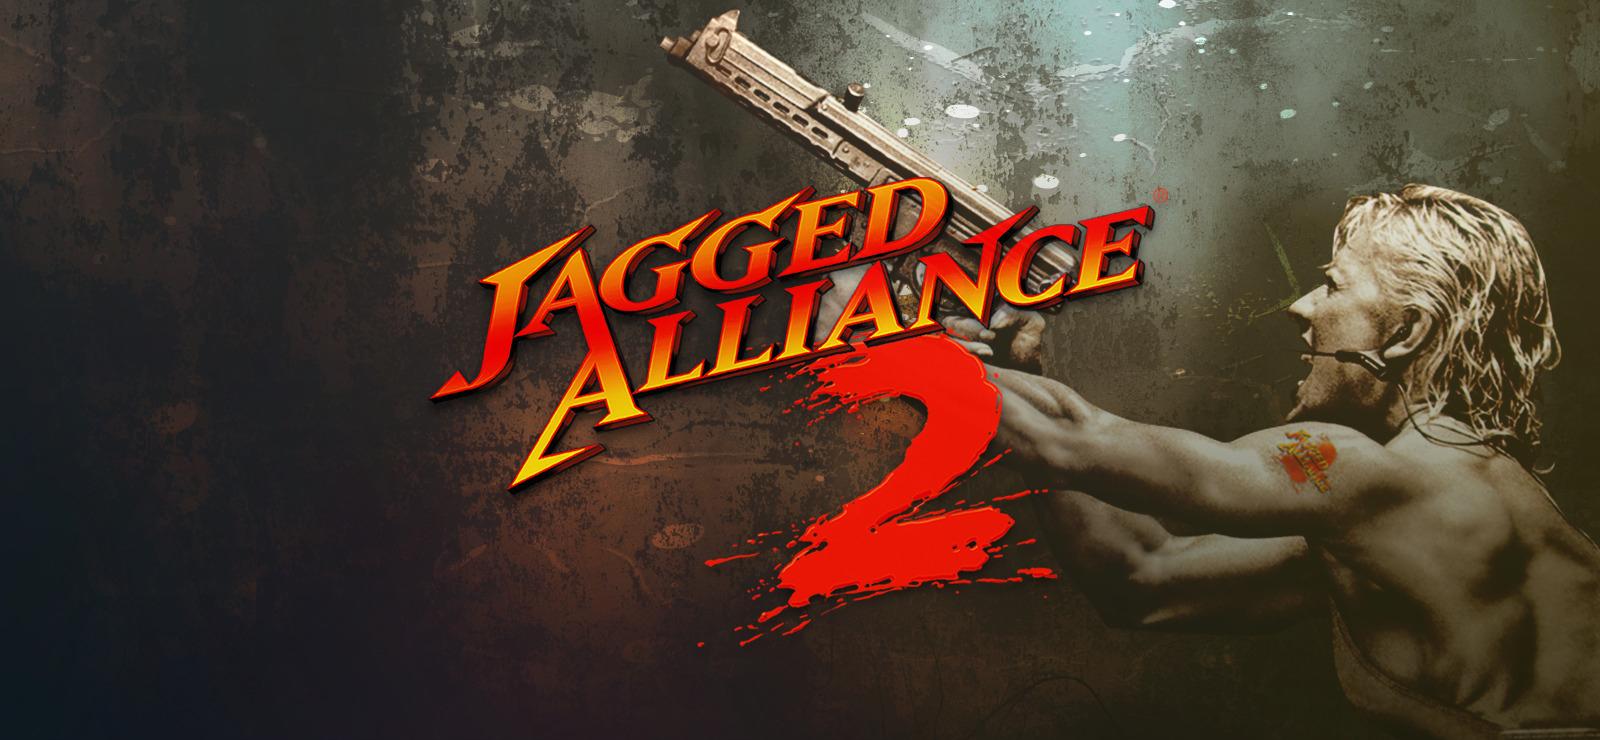 Jagged Alliance 2 für 1,79€ und Jagged Alliance 1 für 1,29€ bei GOG